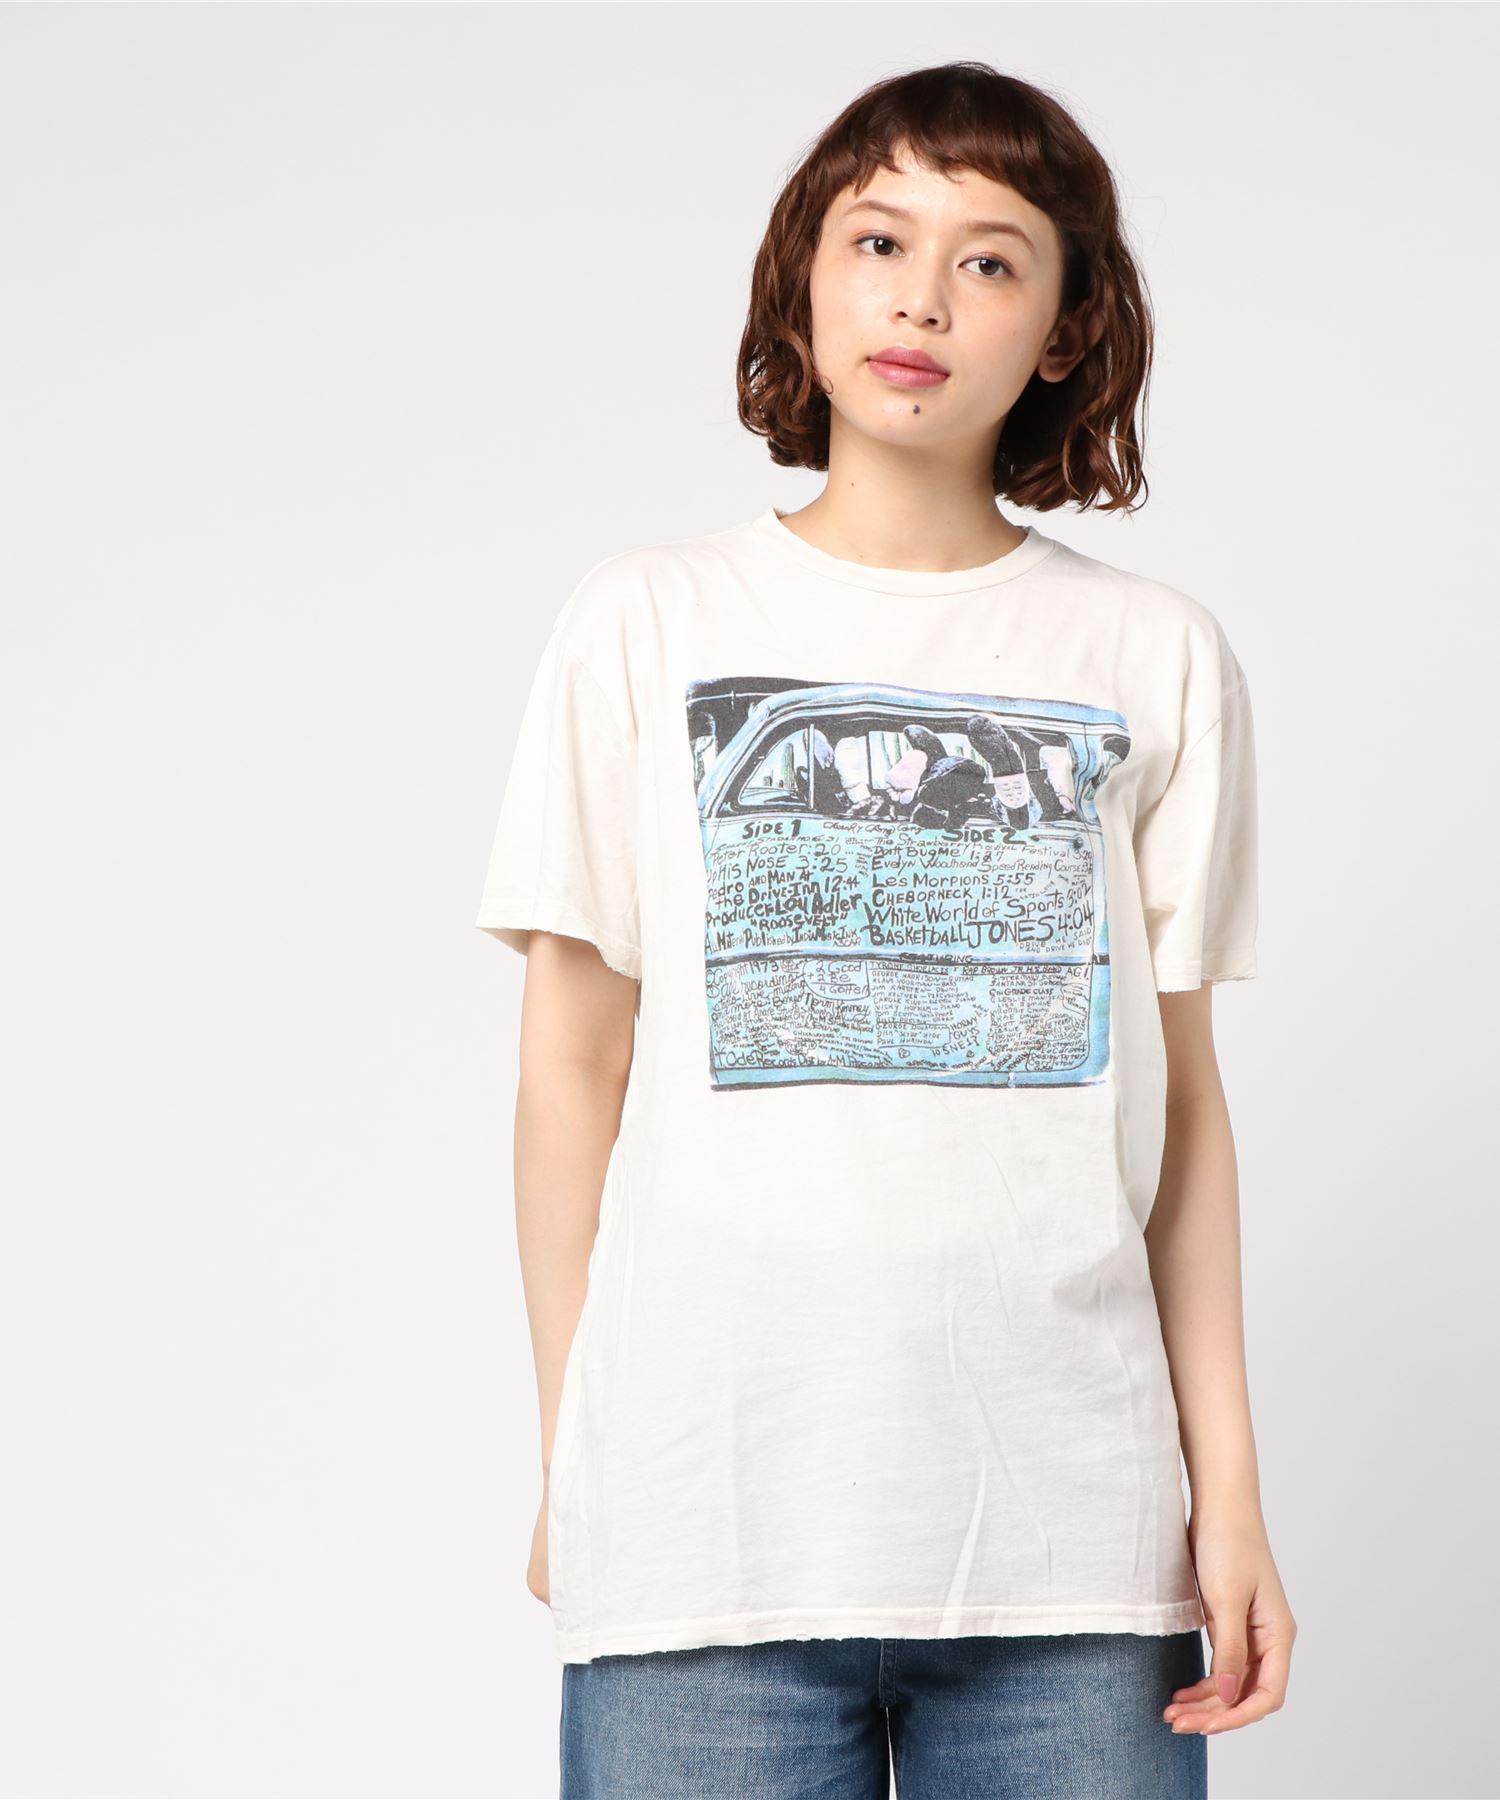 【RETRO BRAND】CHHECH&CHONG Tシャツ